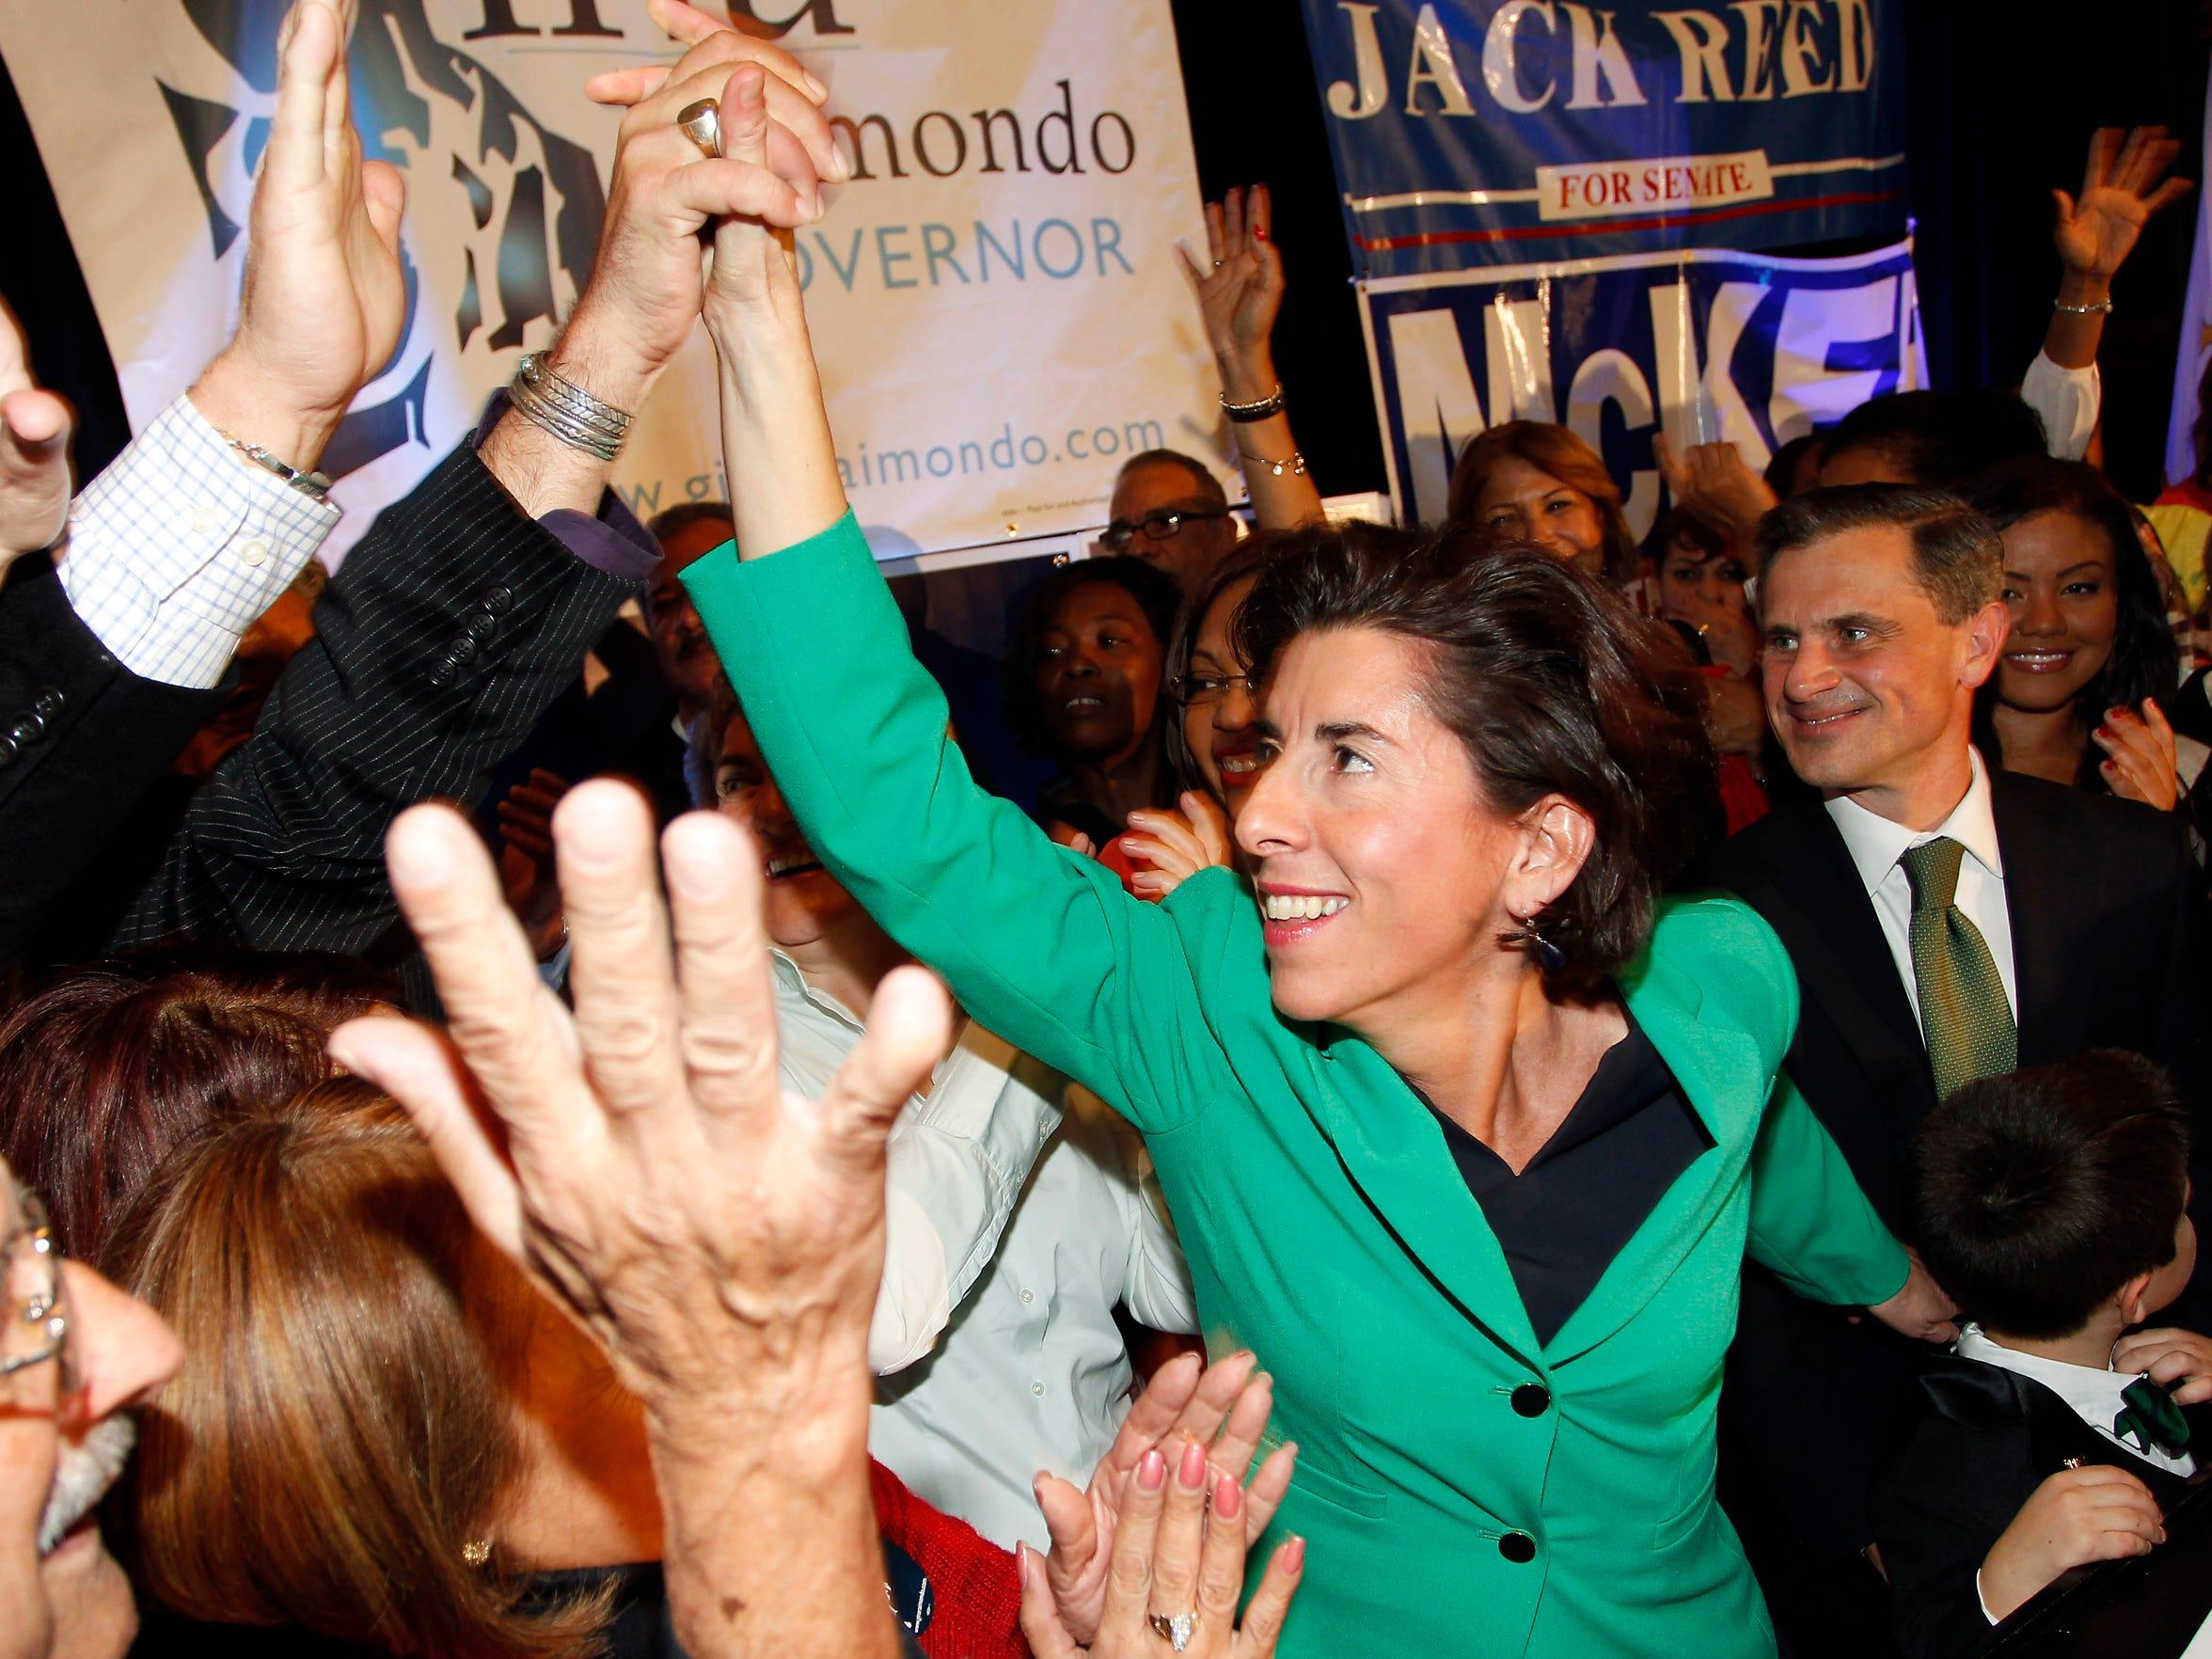 Governor Race Rhode Island